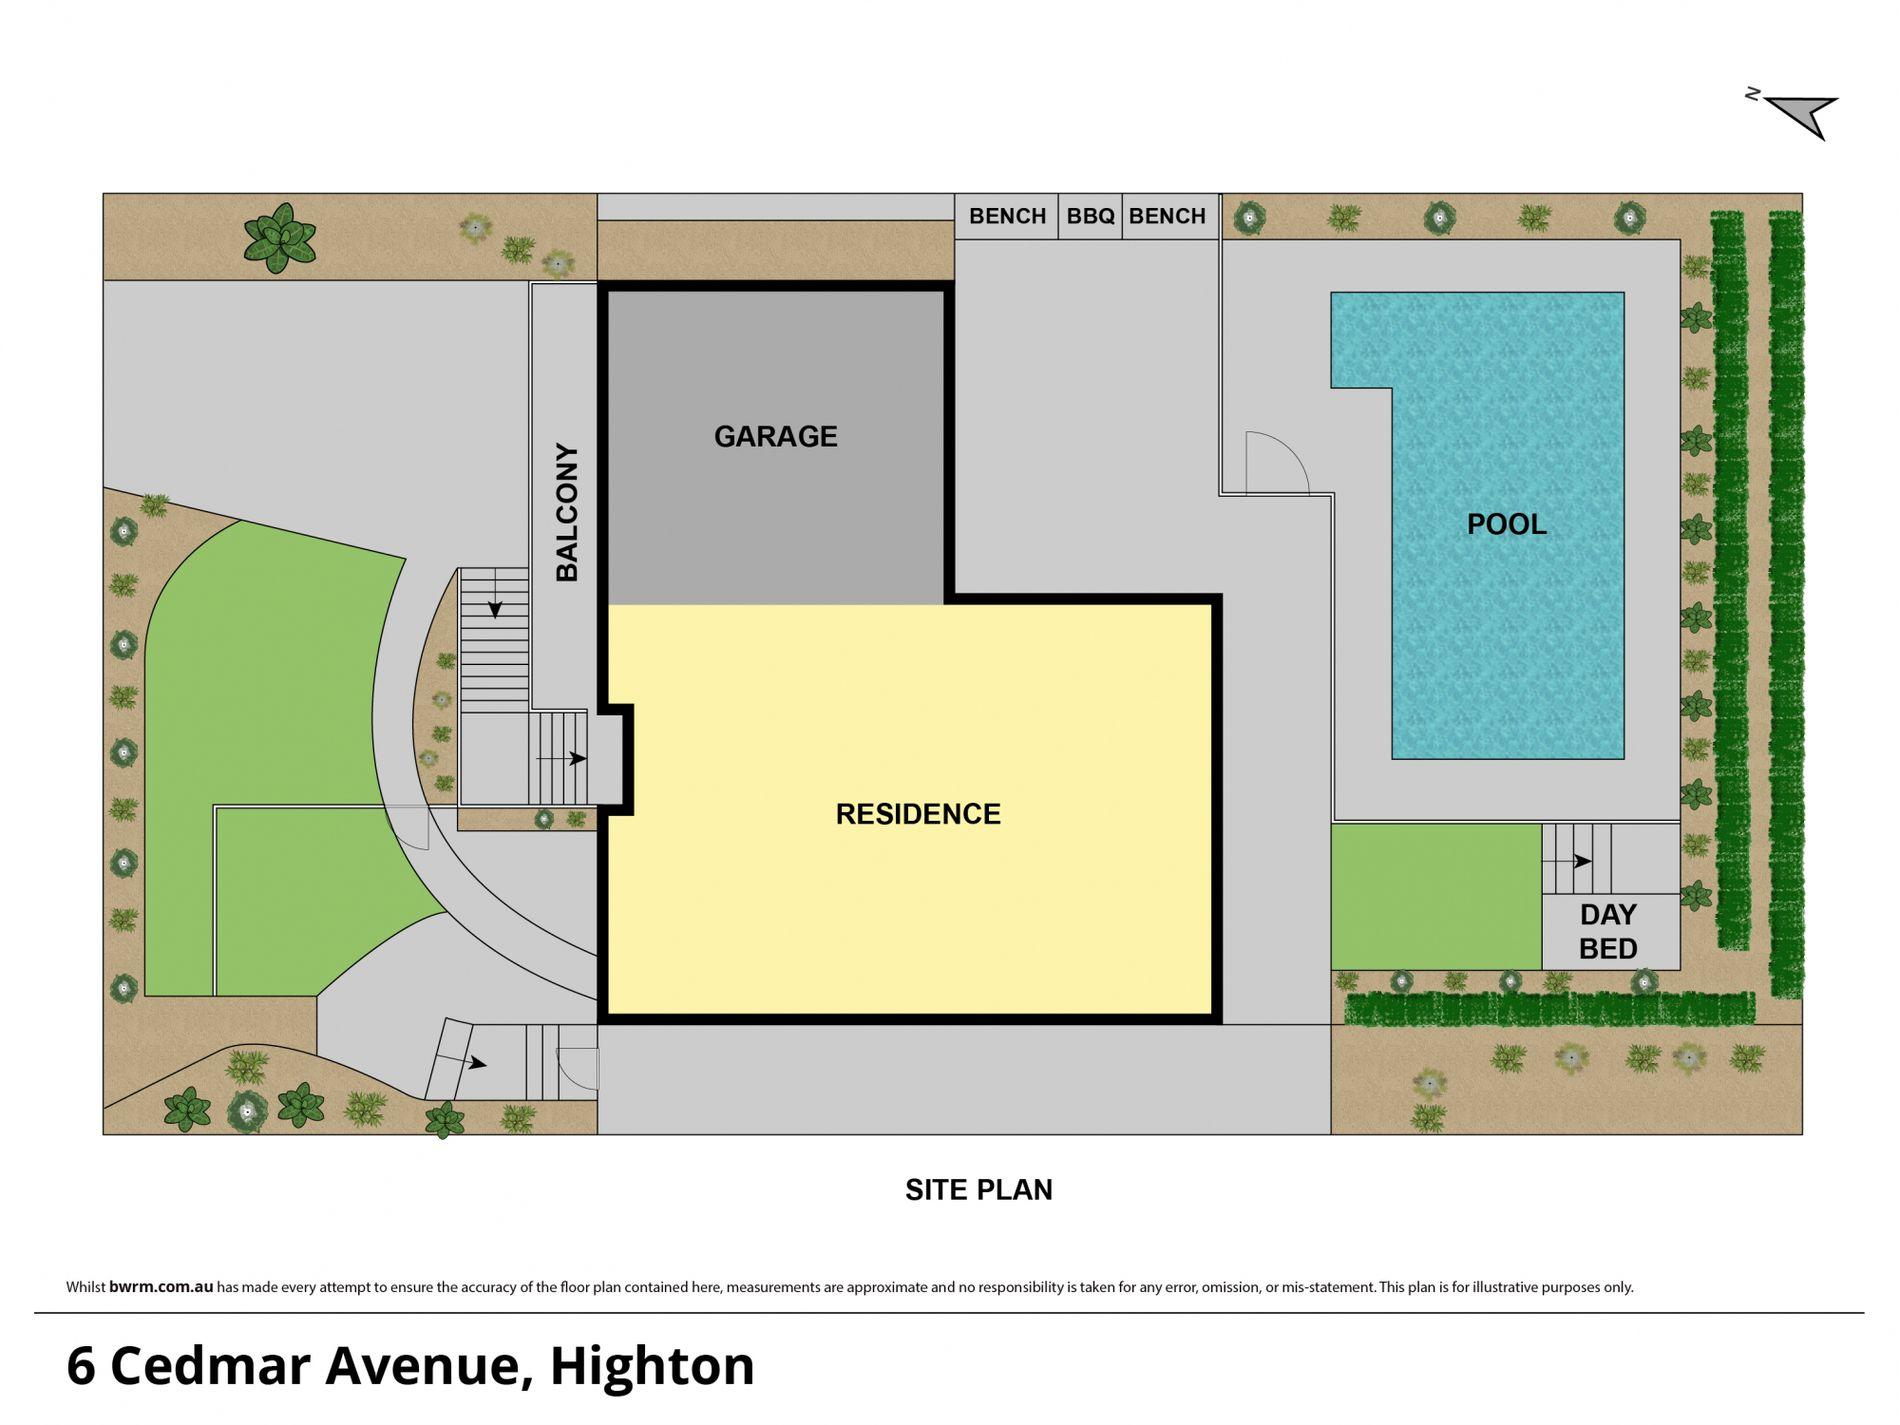 6 Cedmar Avenue, Highton